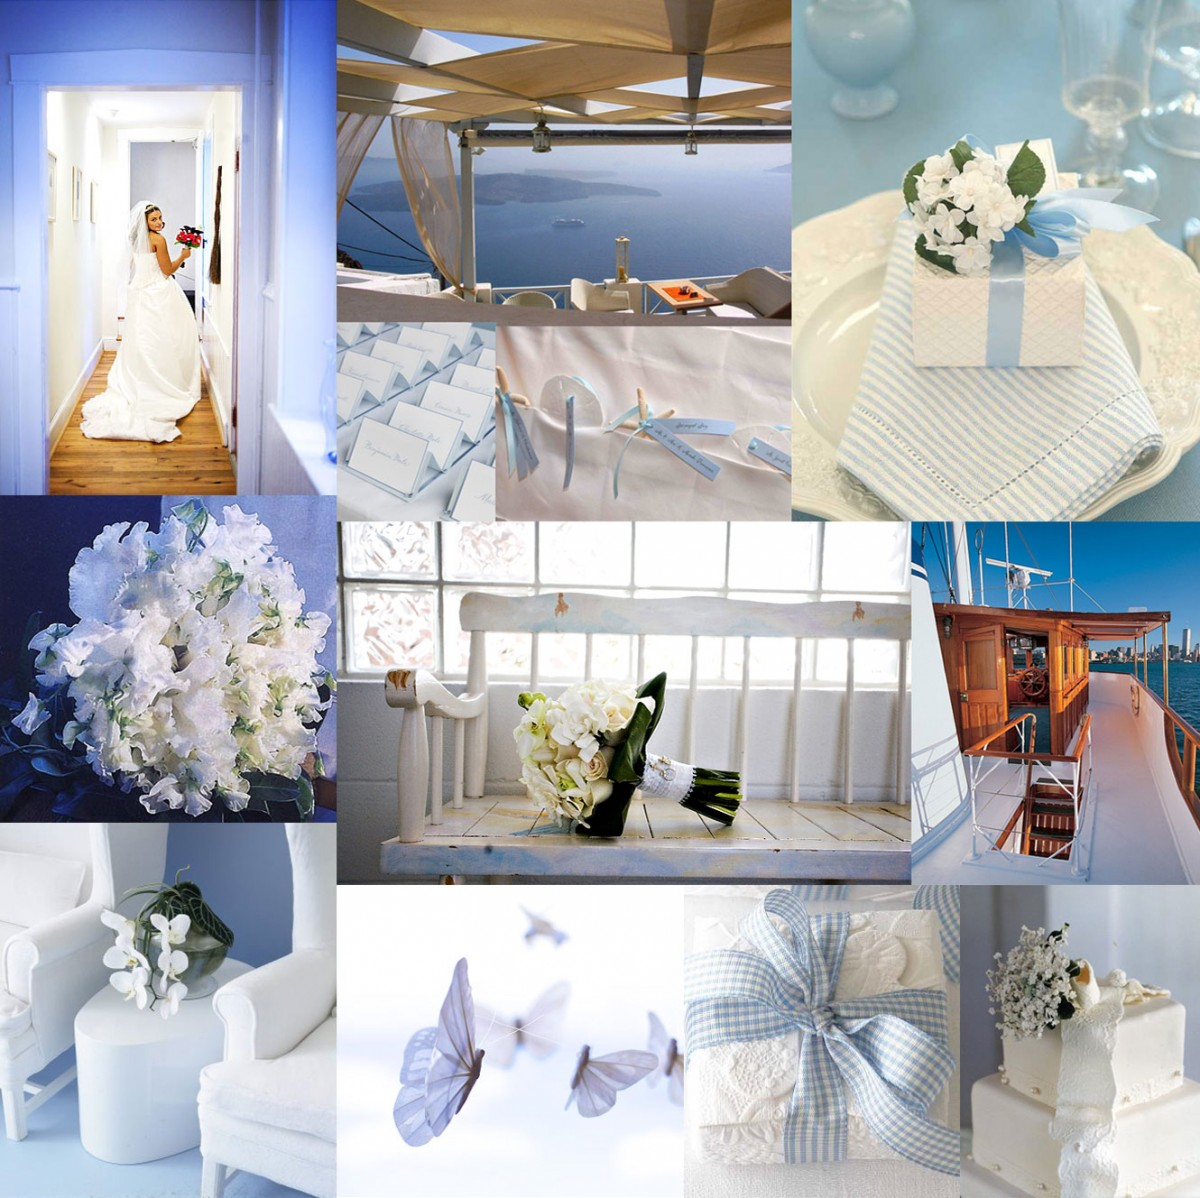 Ocean Blue and White - Elizabeth Anne Designs: The Wedding Blog